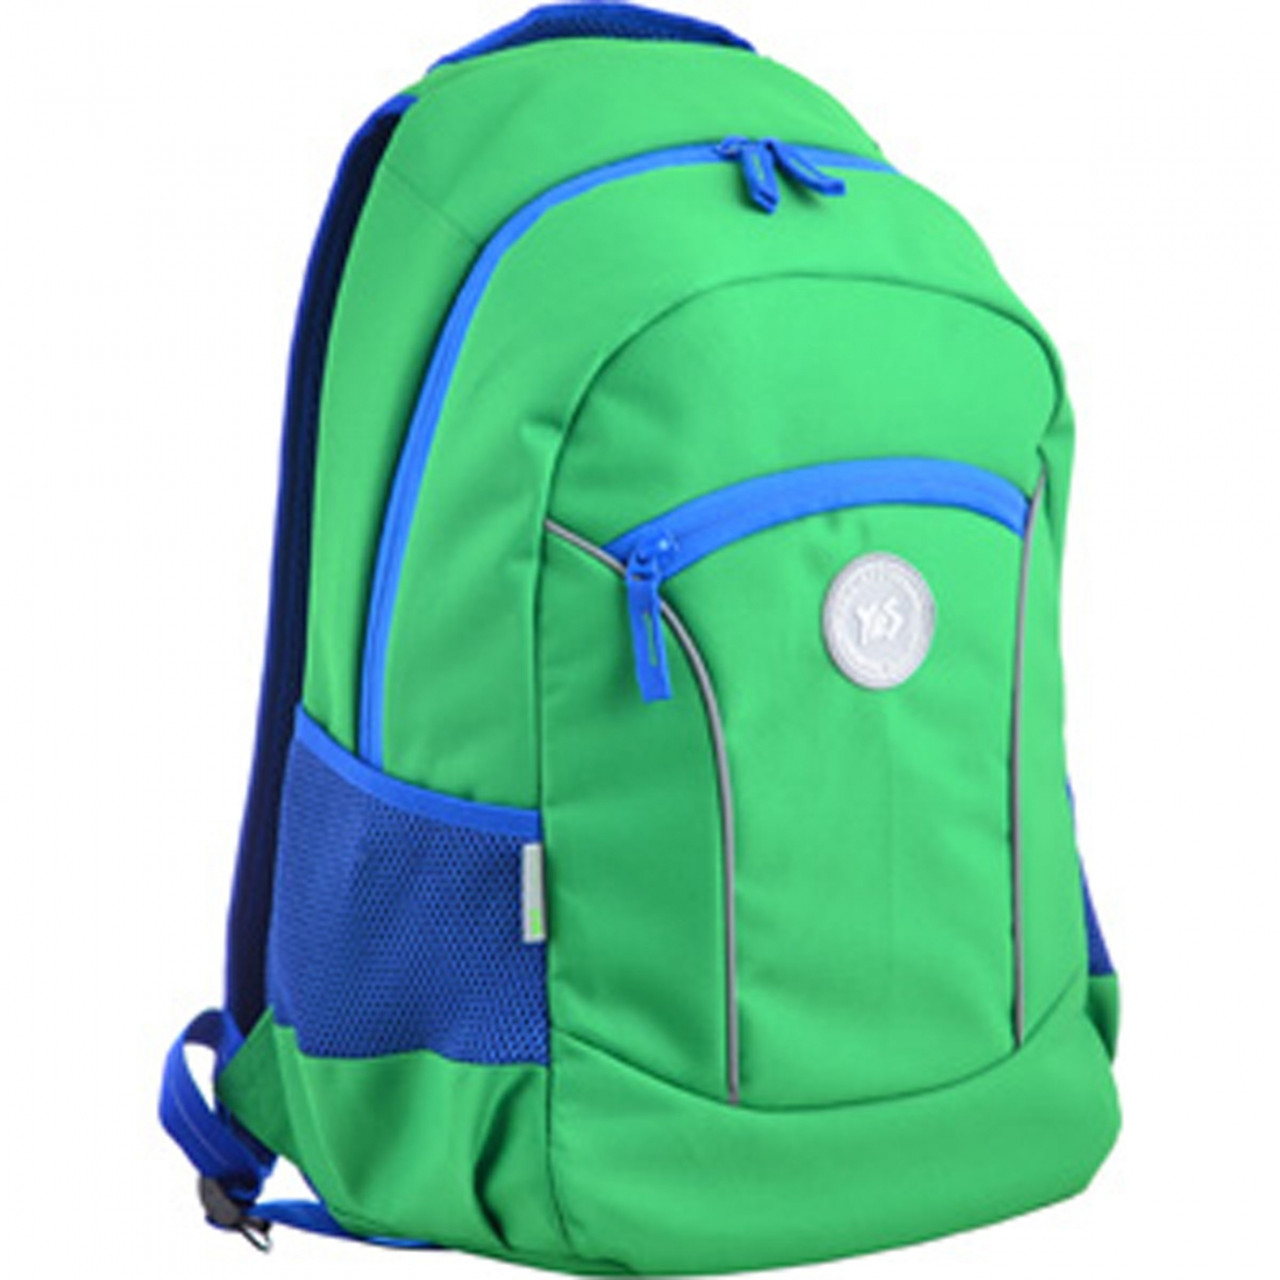 Рюкзак молодежный YES  Т-39 Coolness, 48*30*16